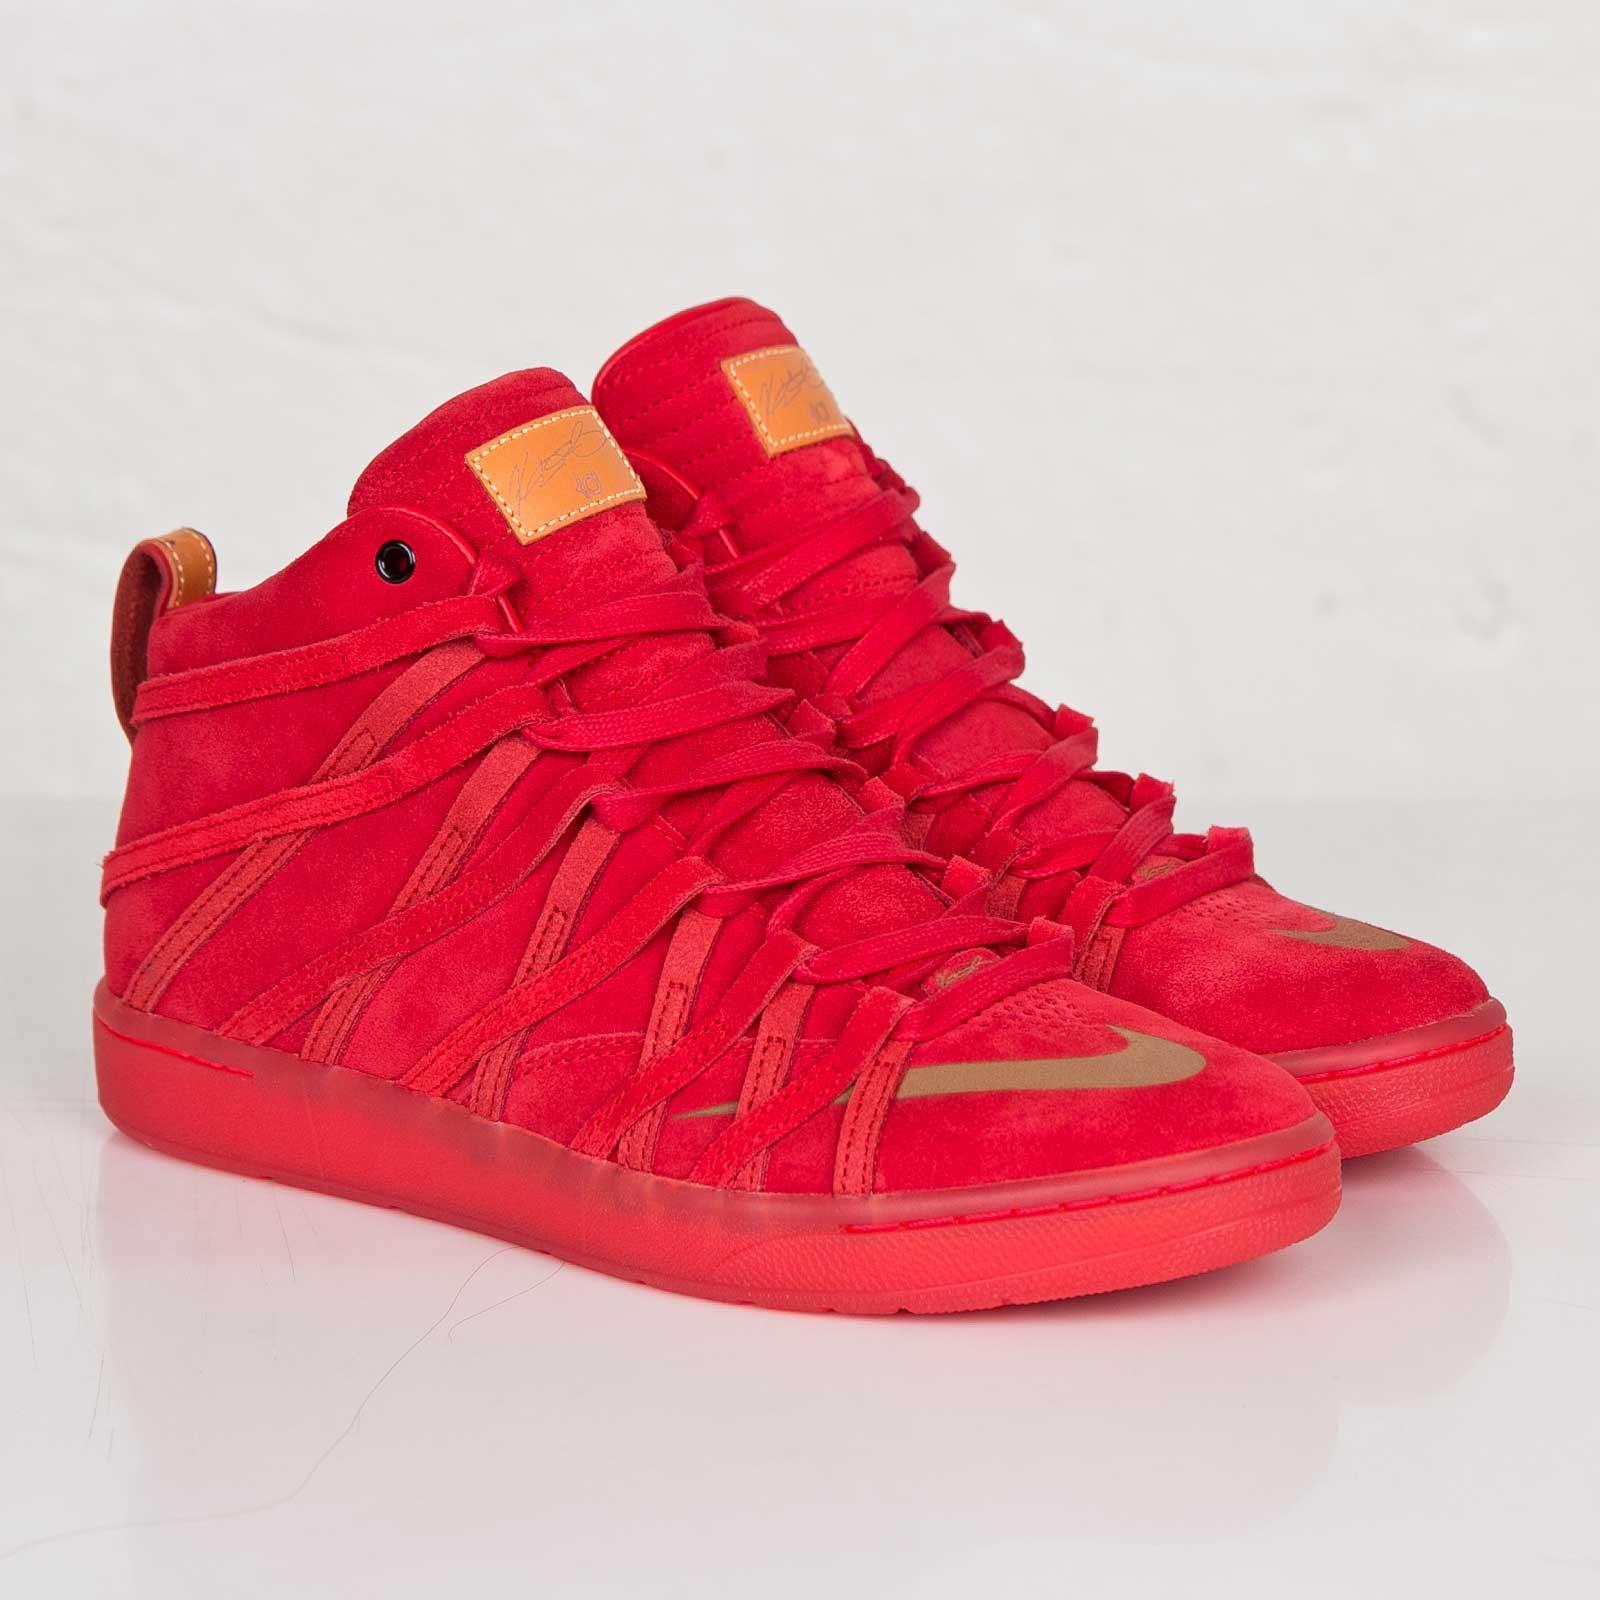 Nike Kd Vii Nsw Lifestyle Zapatillasnstuff Qs 653871 600 Zapatillasnstuff Lifestyle ddb6af